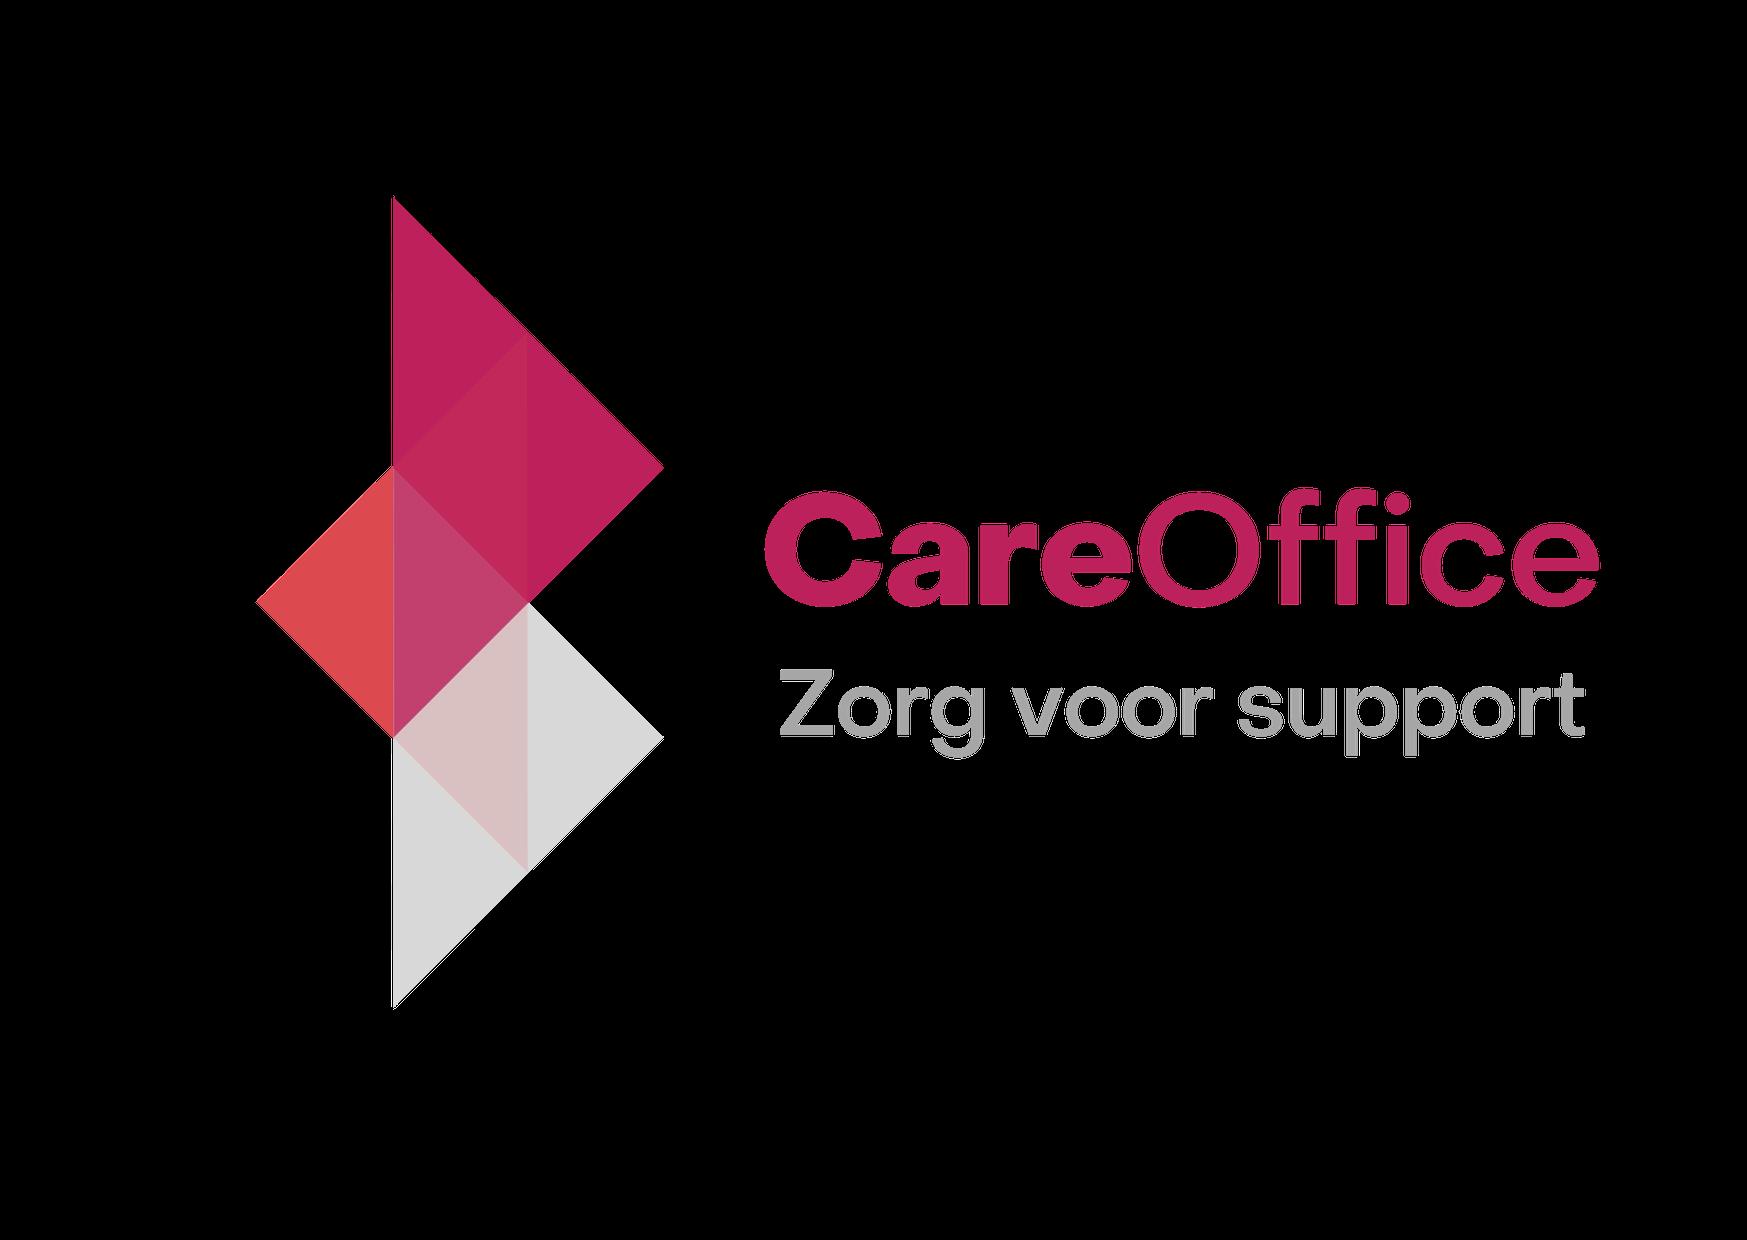 CareOffice